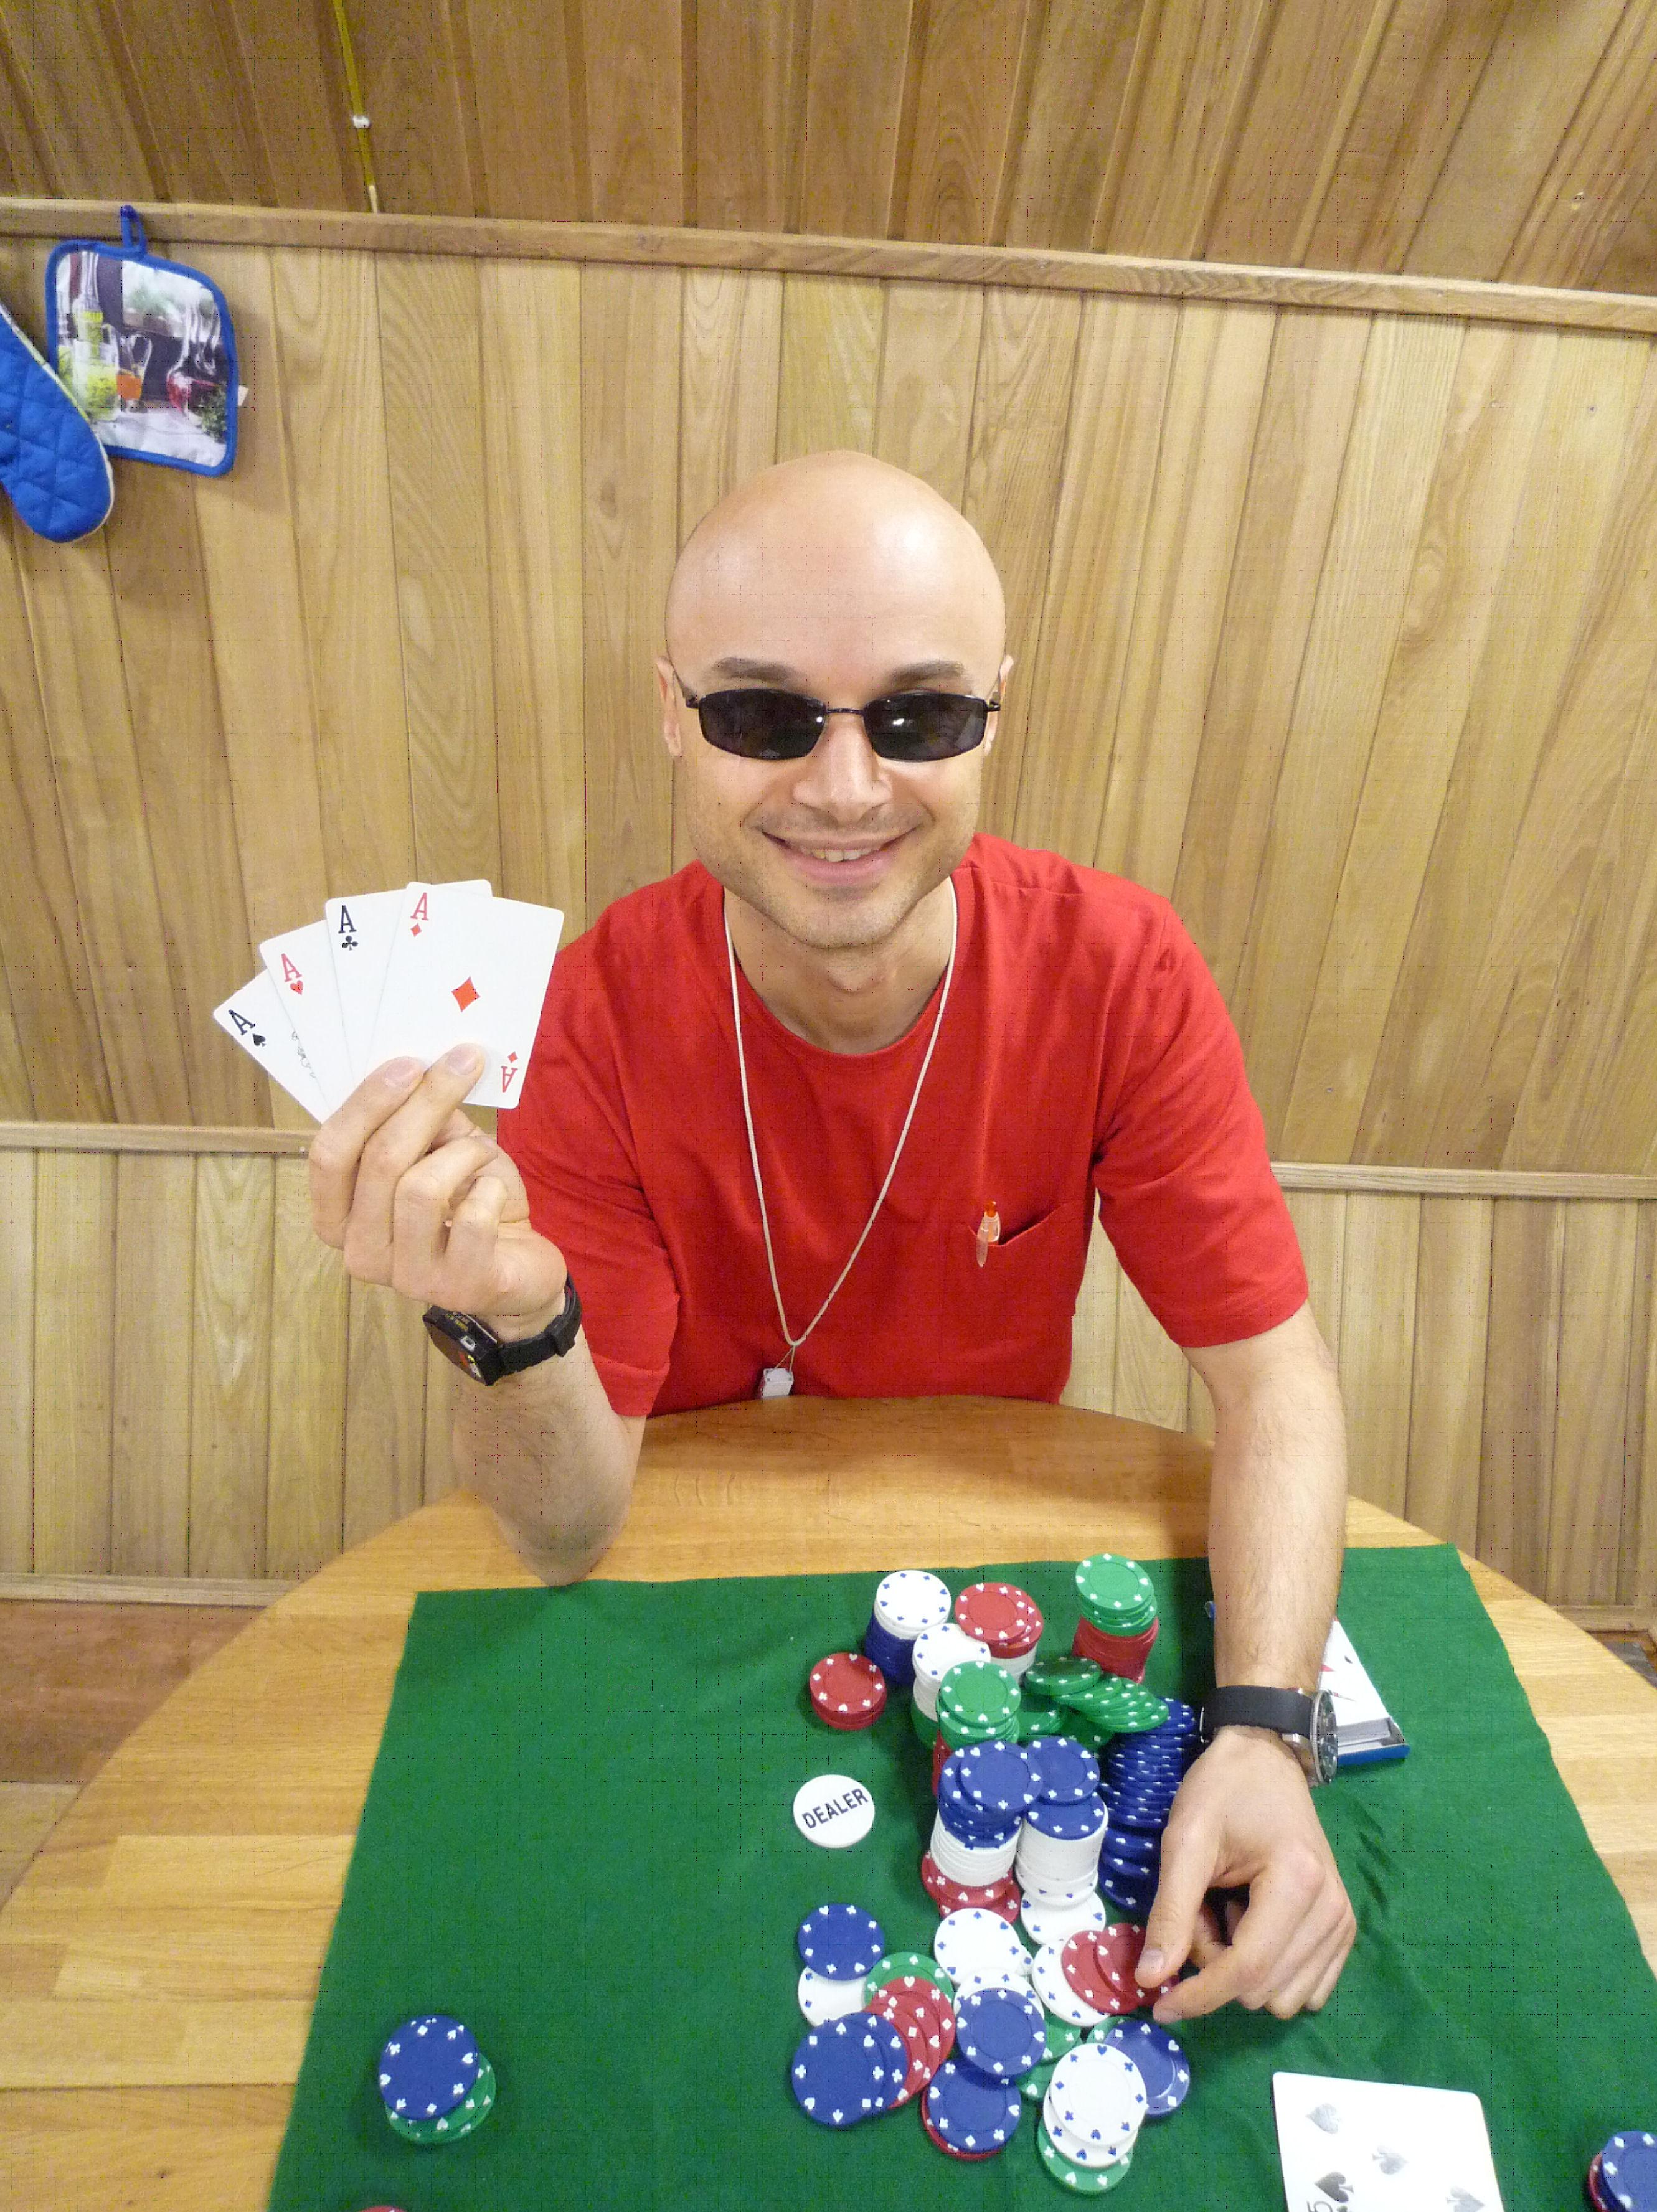 Winning at poker